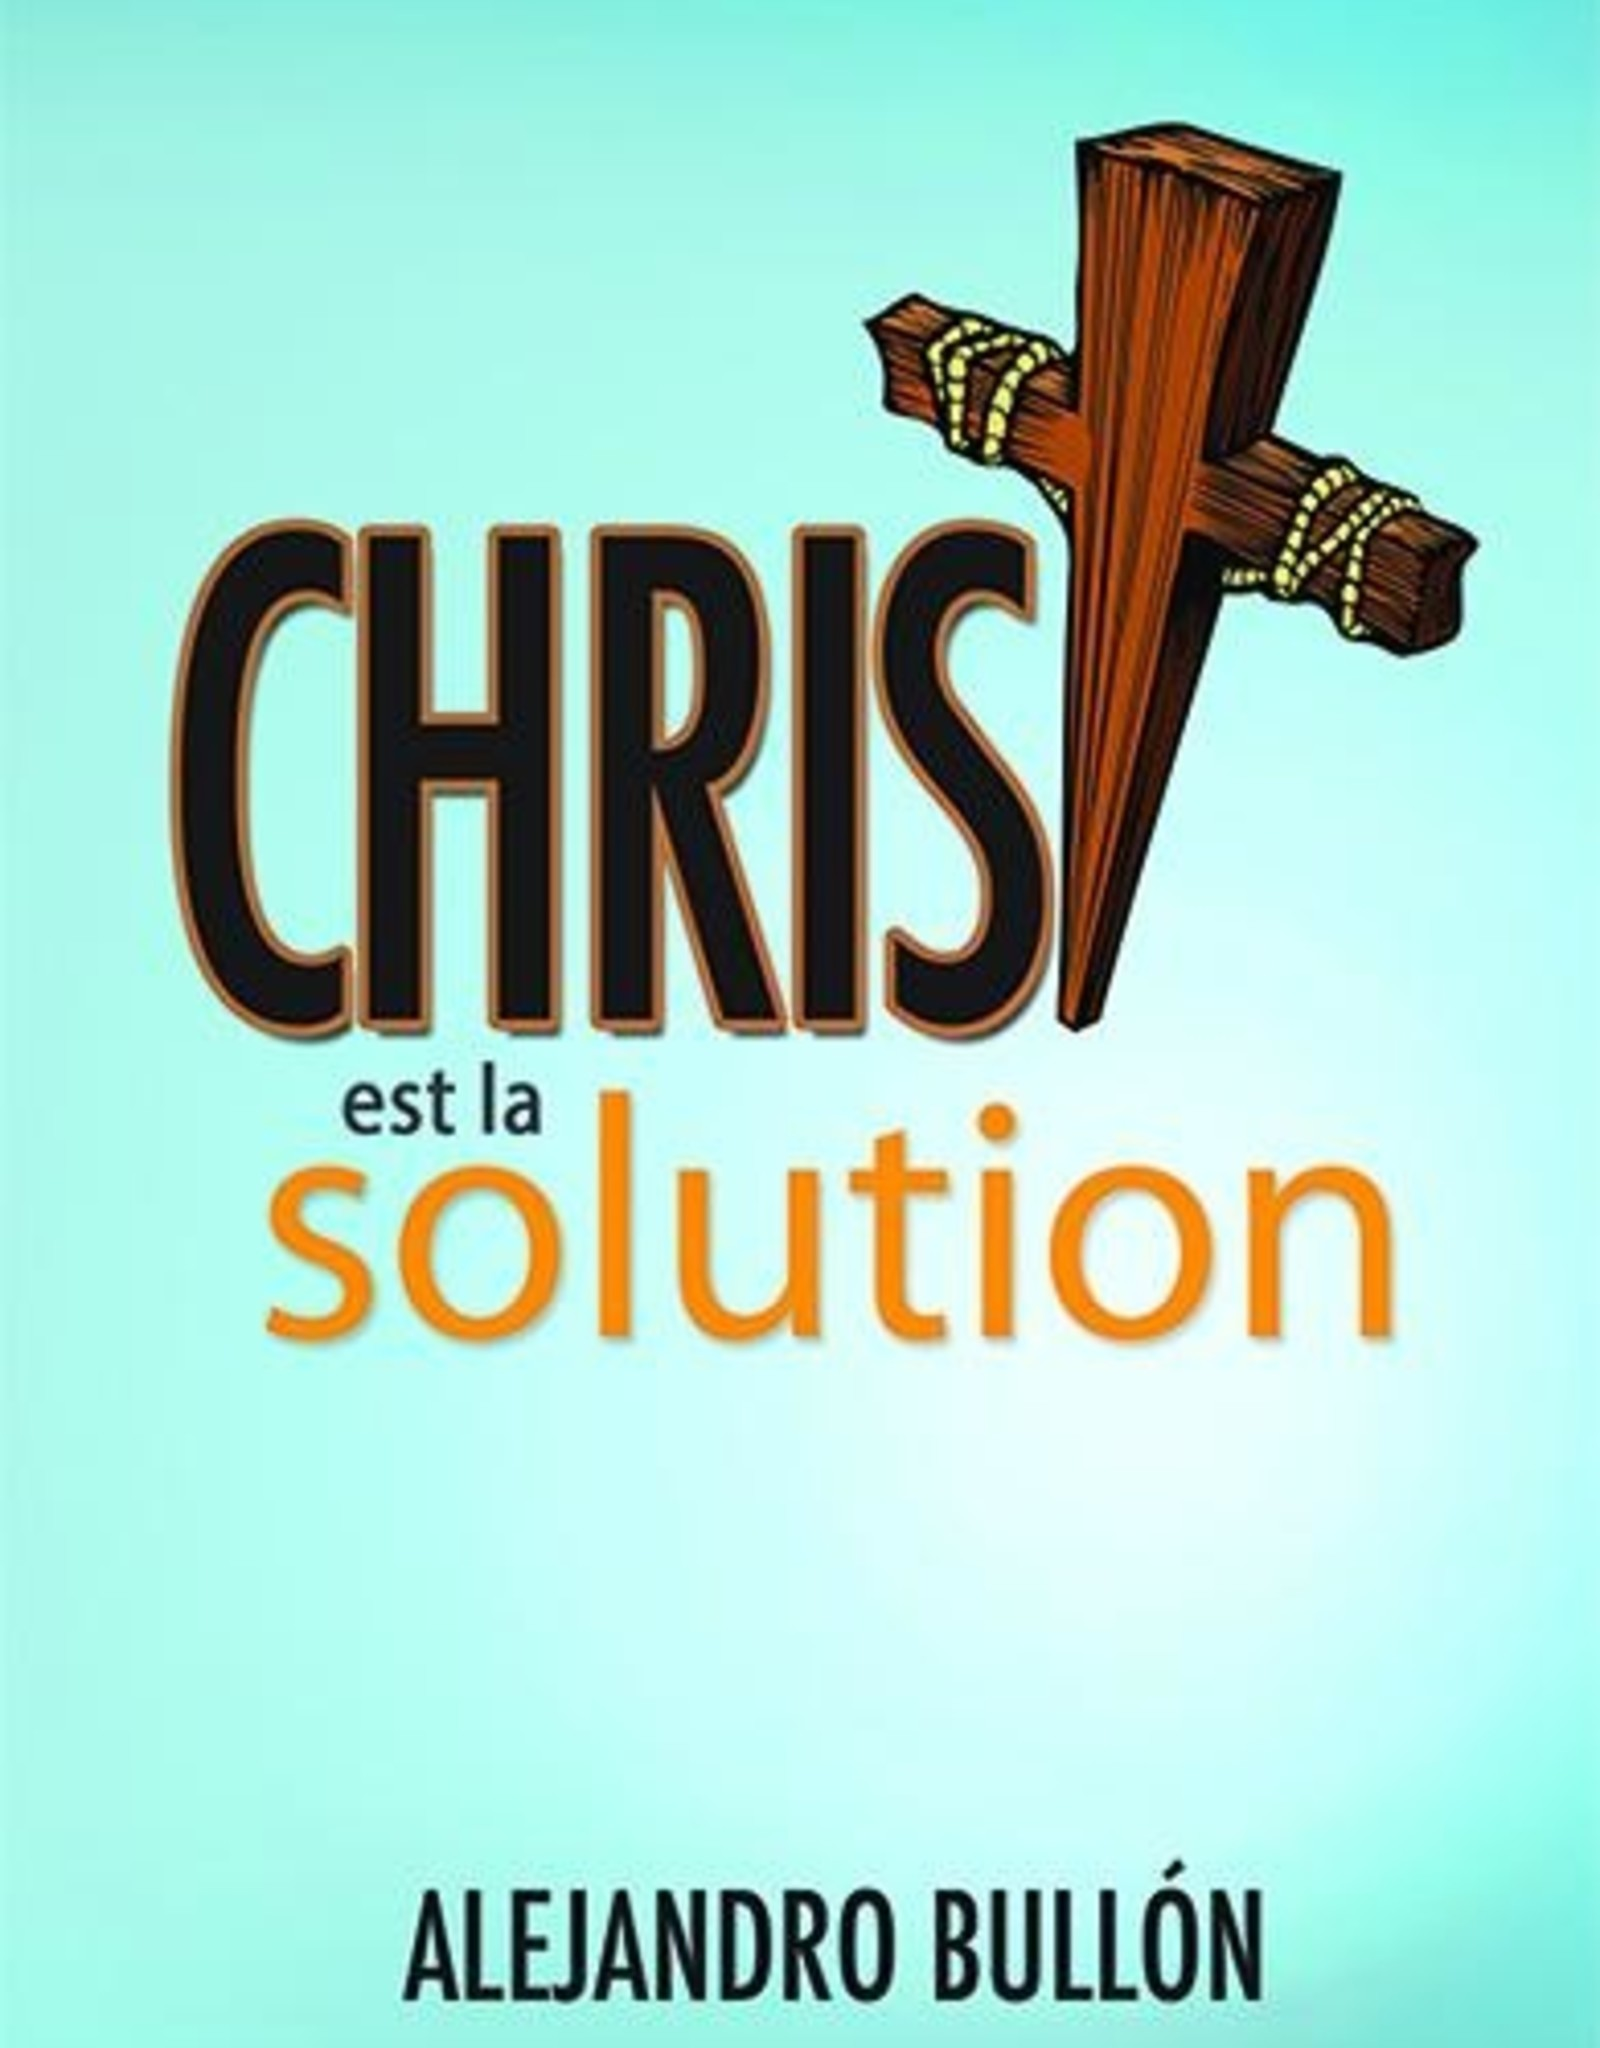 Alejandro Bullon Christ est la solution